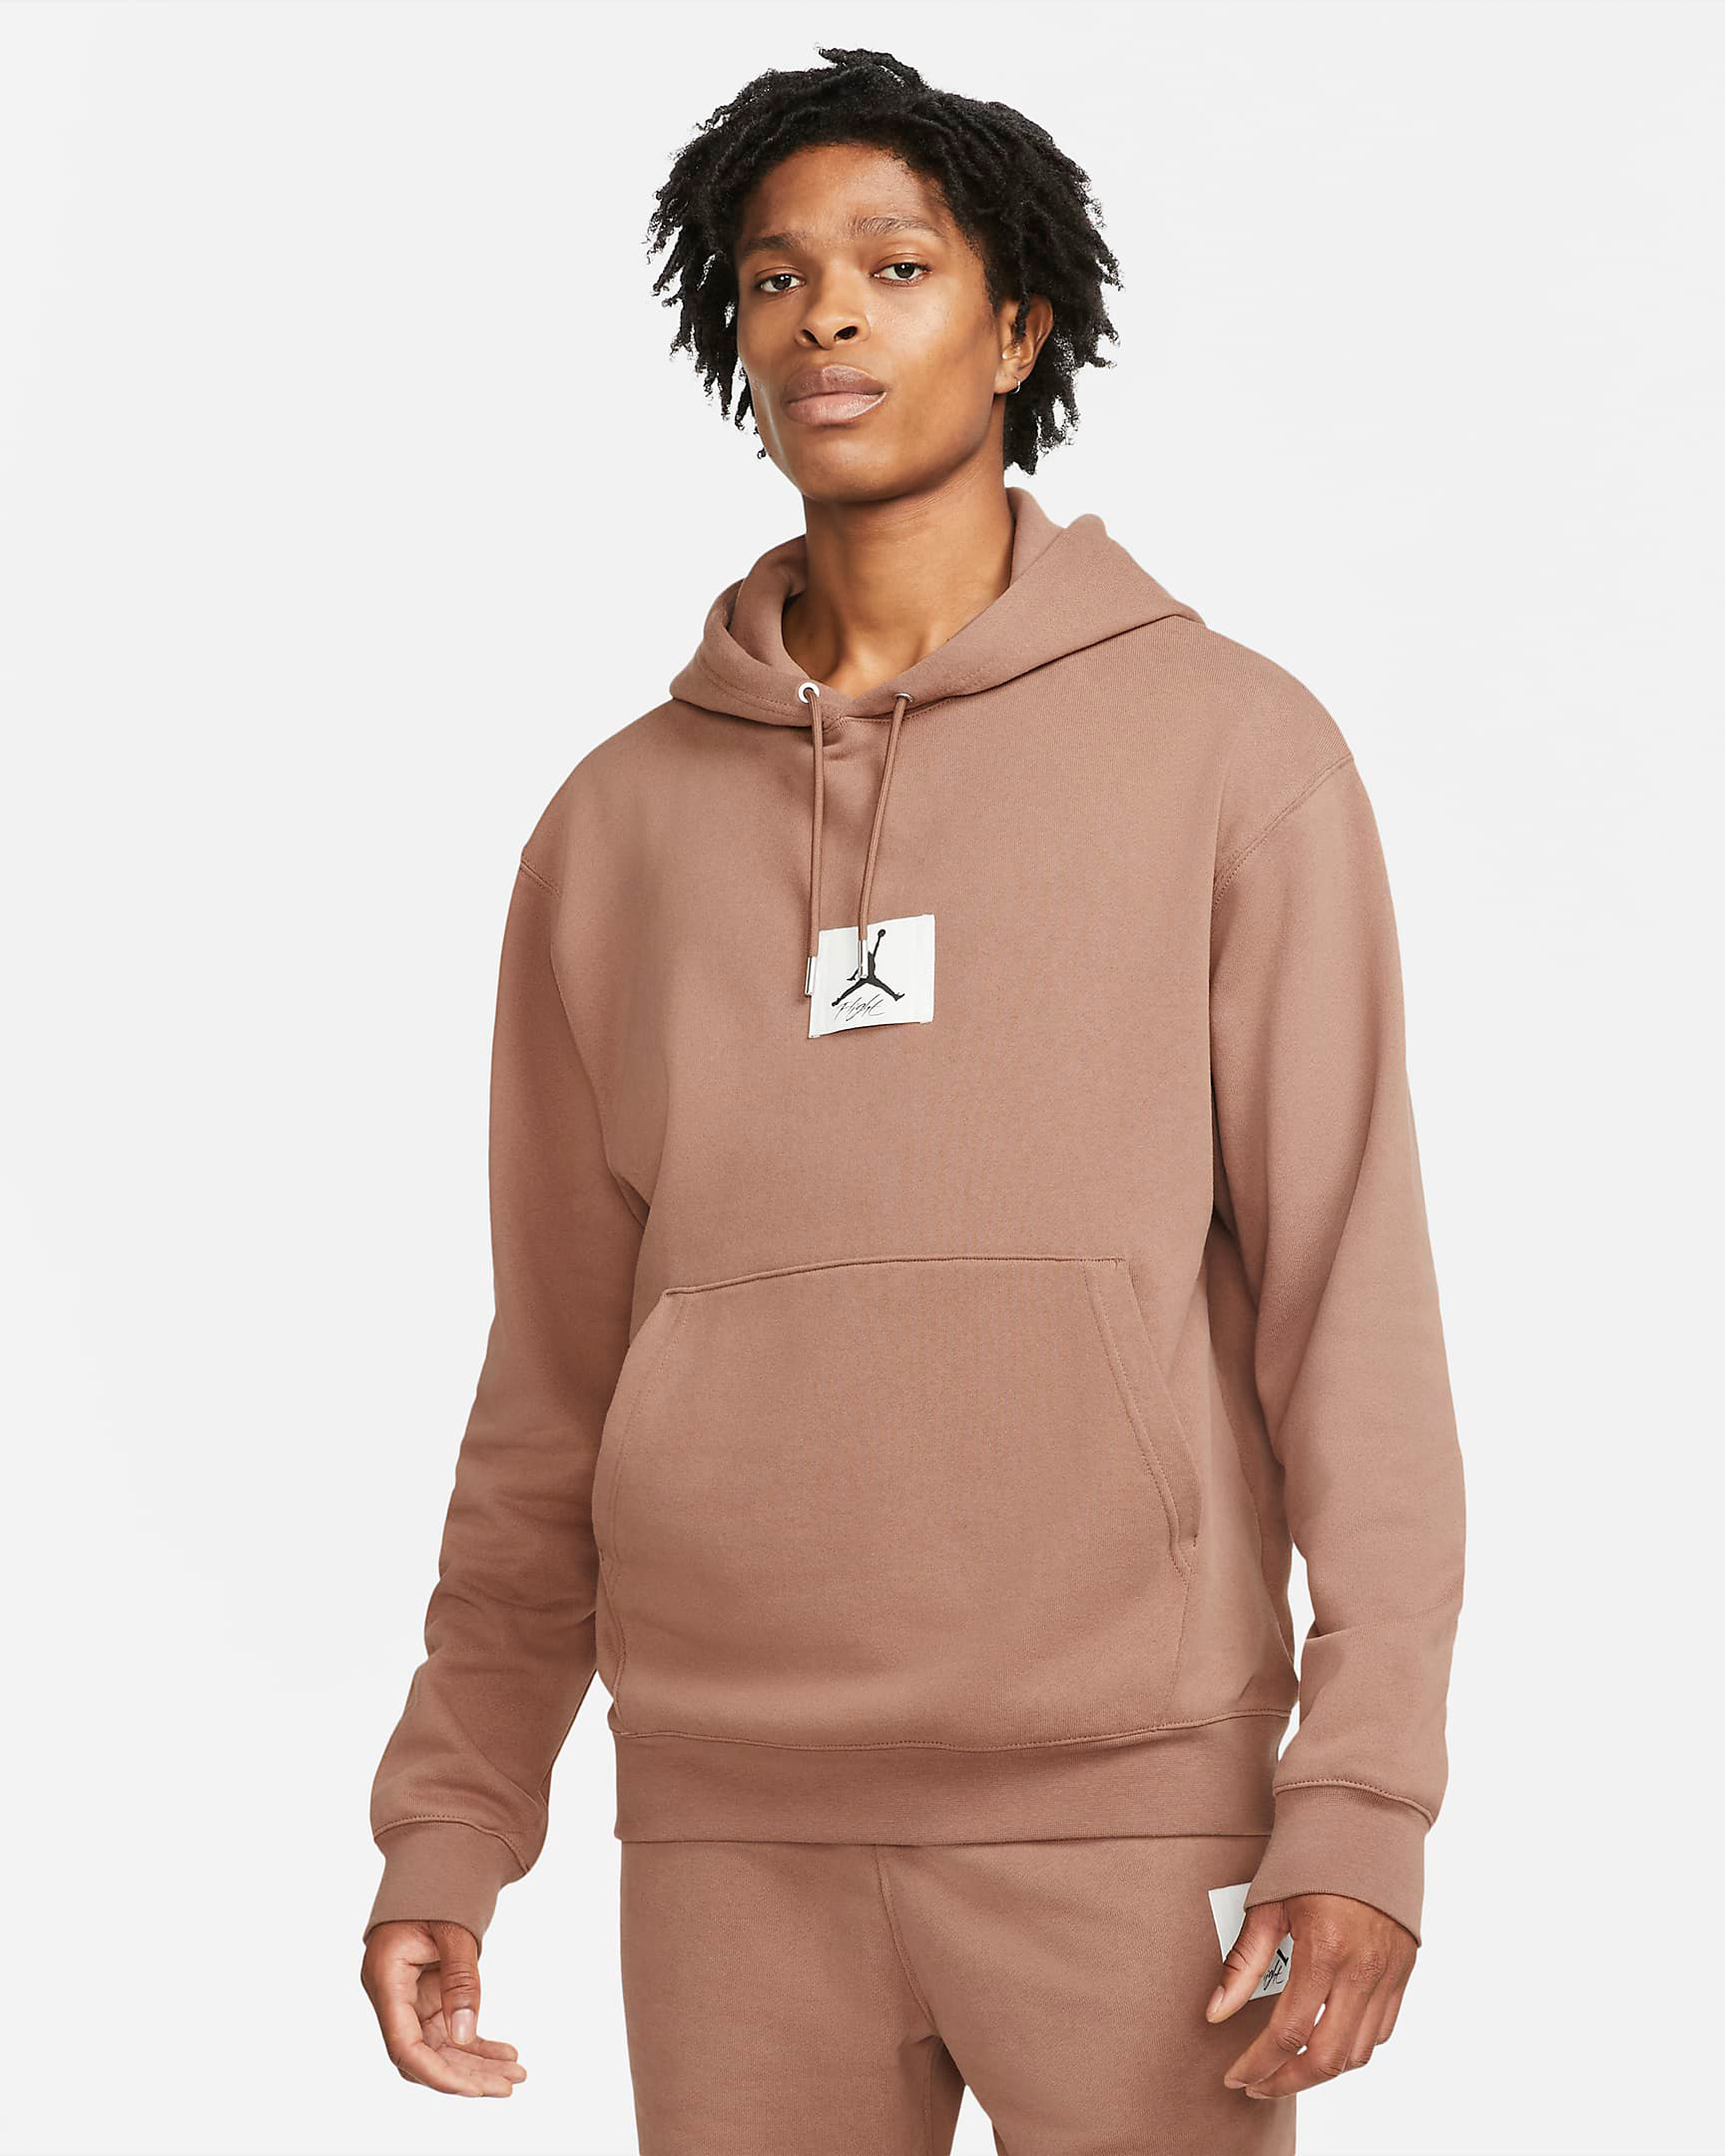 jordan-archaeo-brown-essentials-statement-hoodie